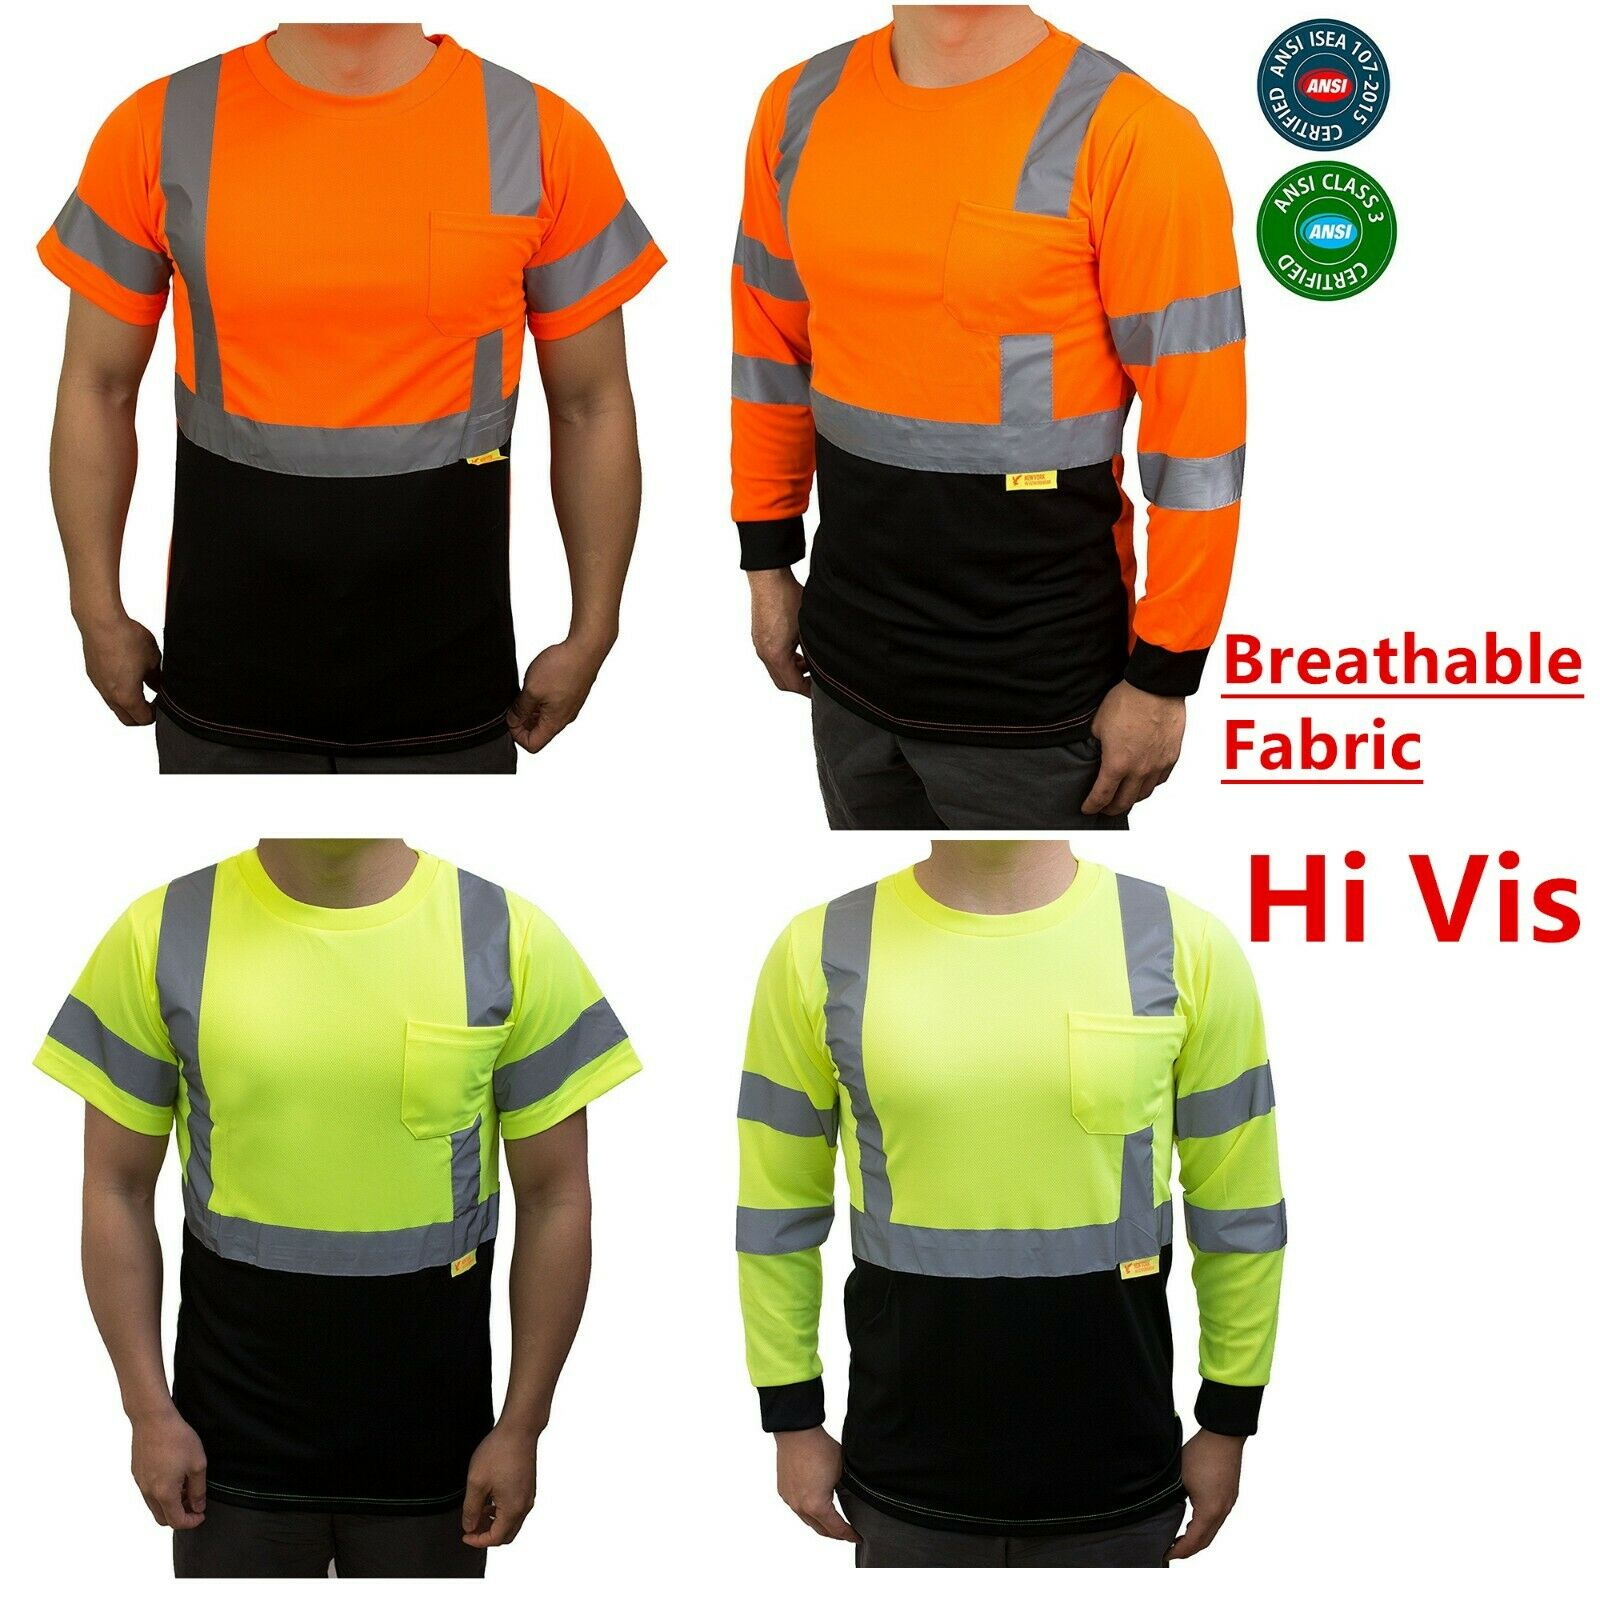 Hi Vis ANSI Class 3 Safety Shirt  Moisture Wicking Mesh Long